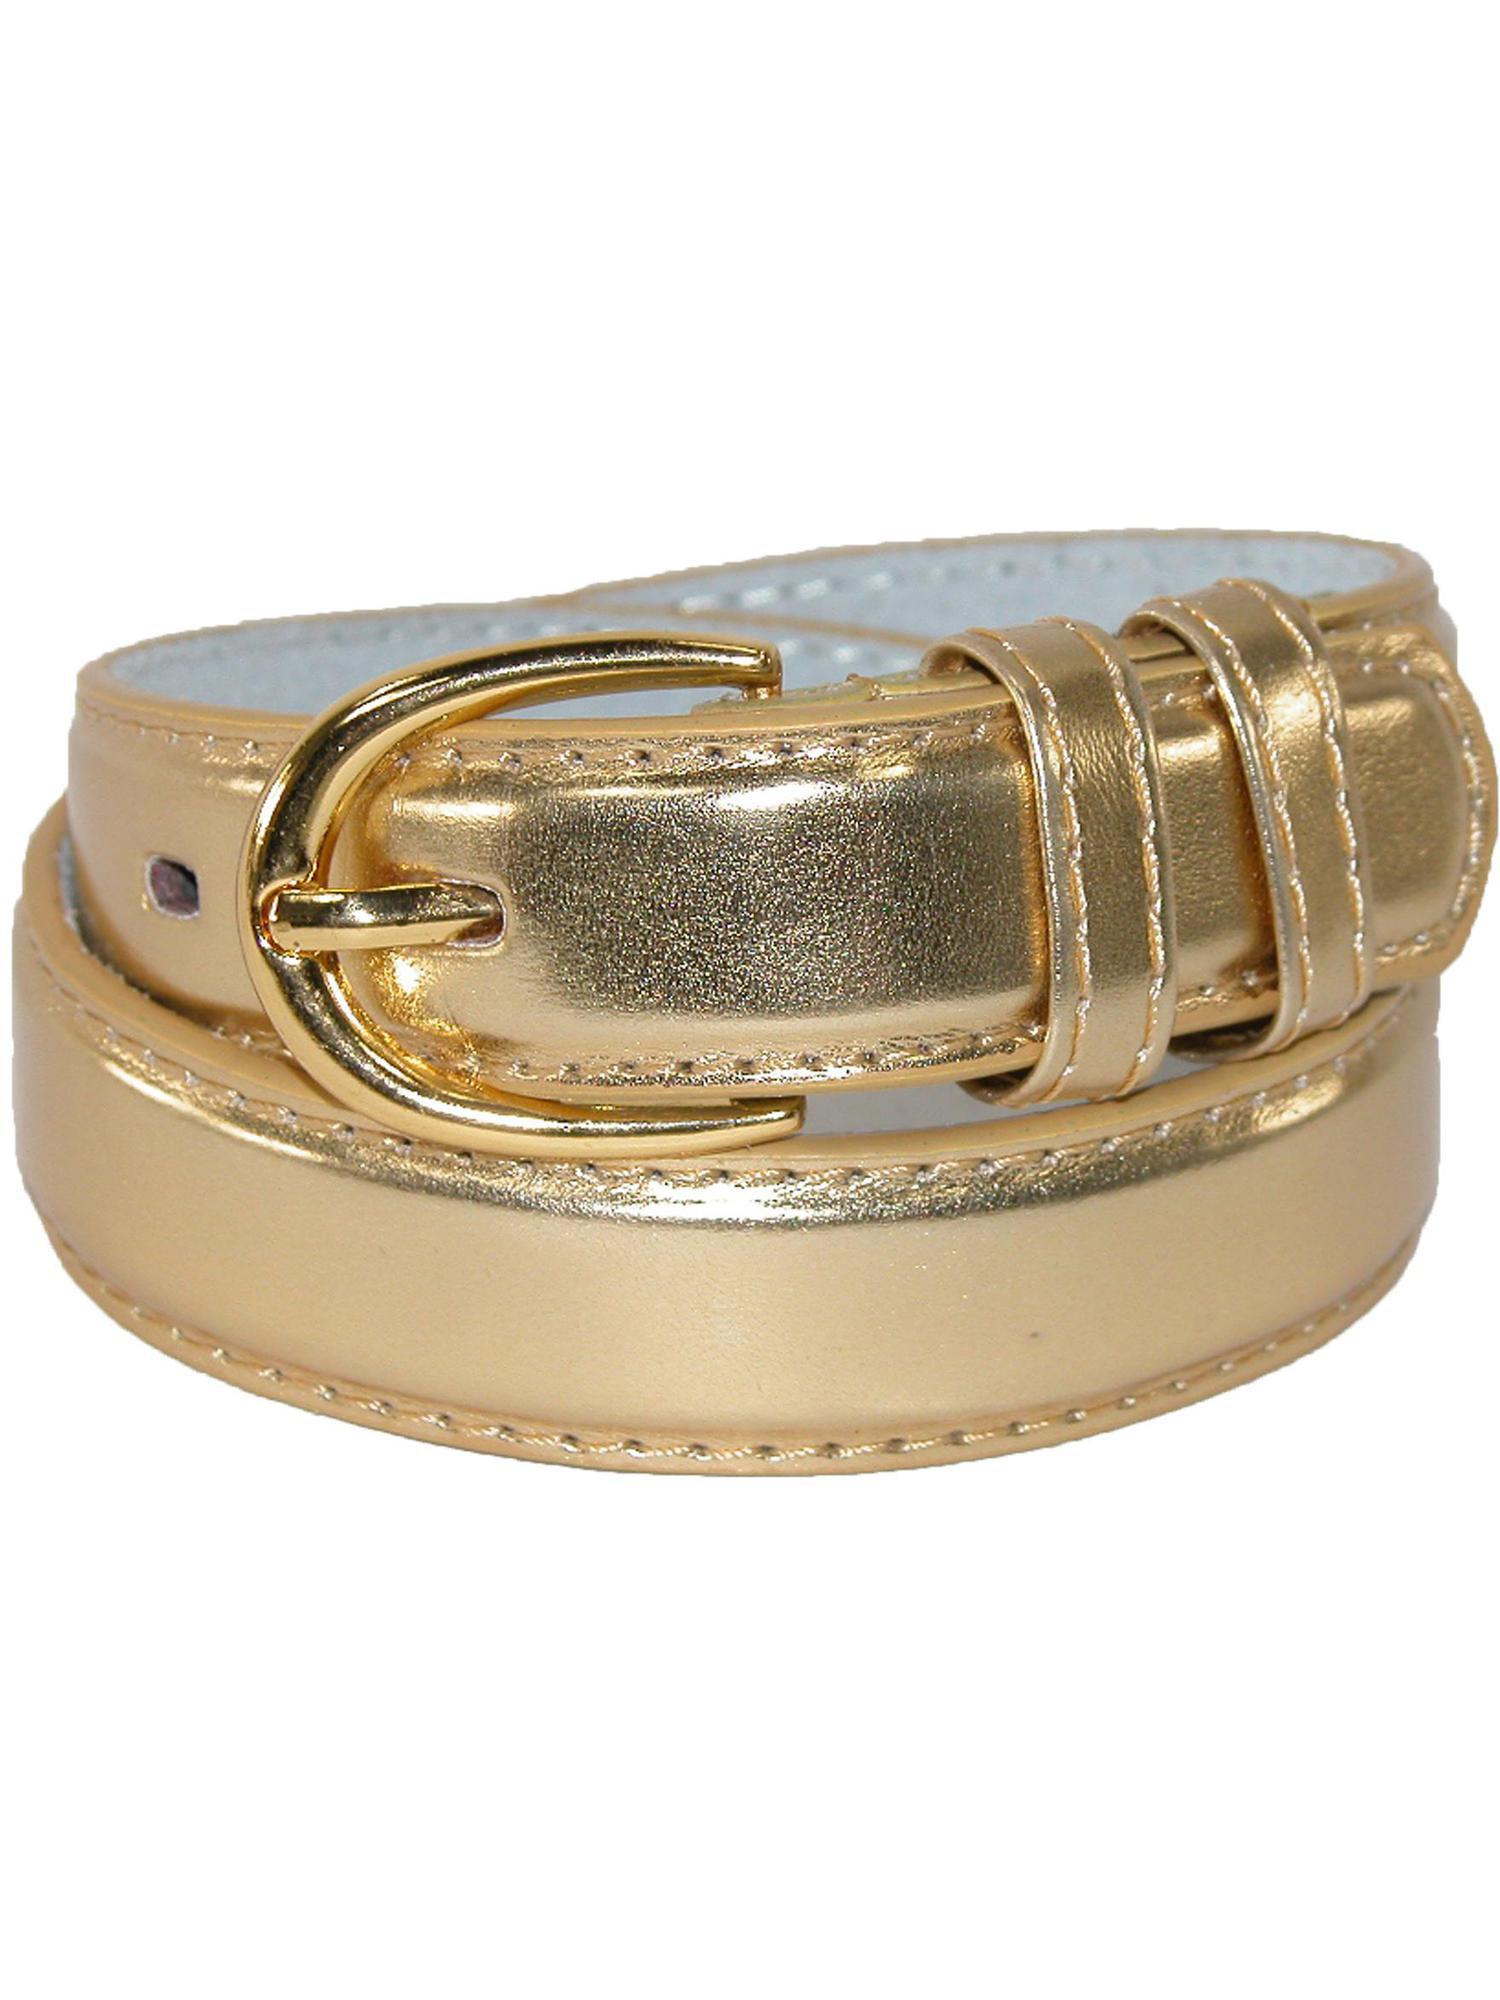 Kid's Leather 1 inch Basic Dress Belt (Pack of 2)